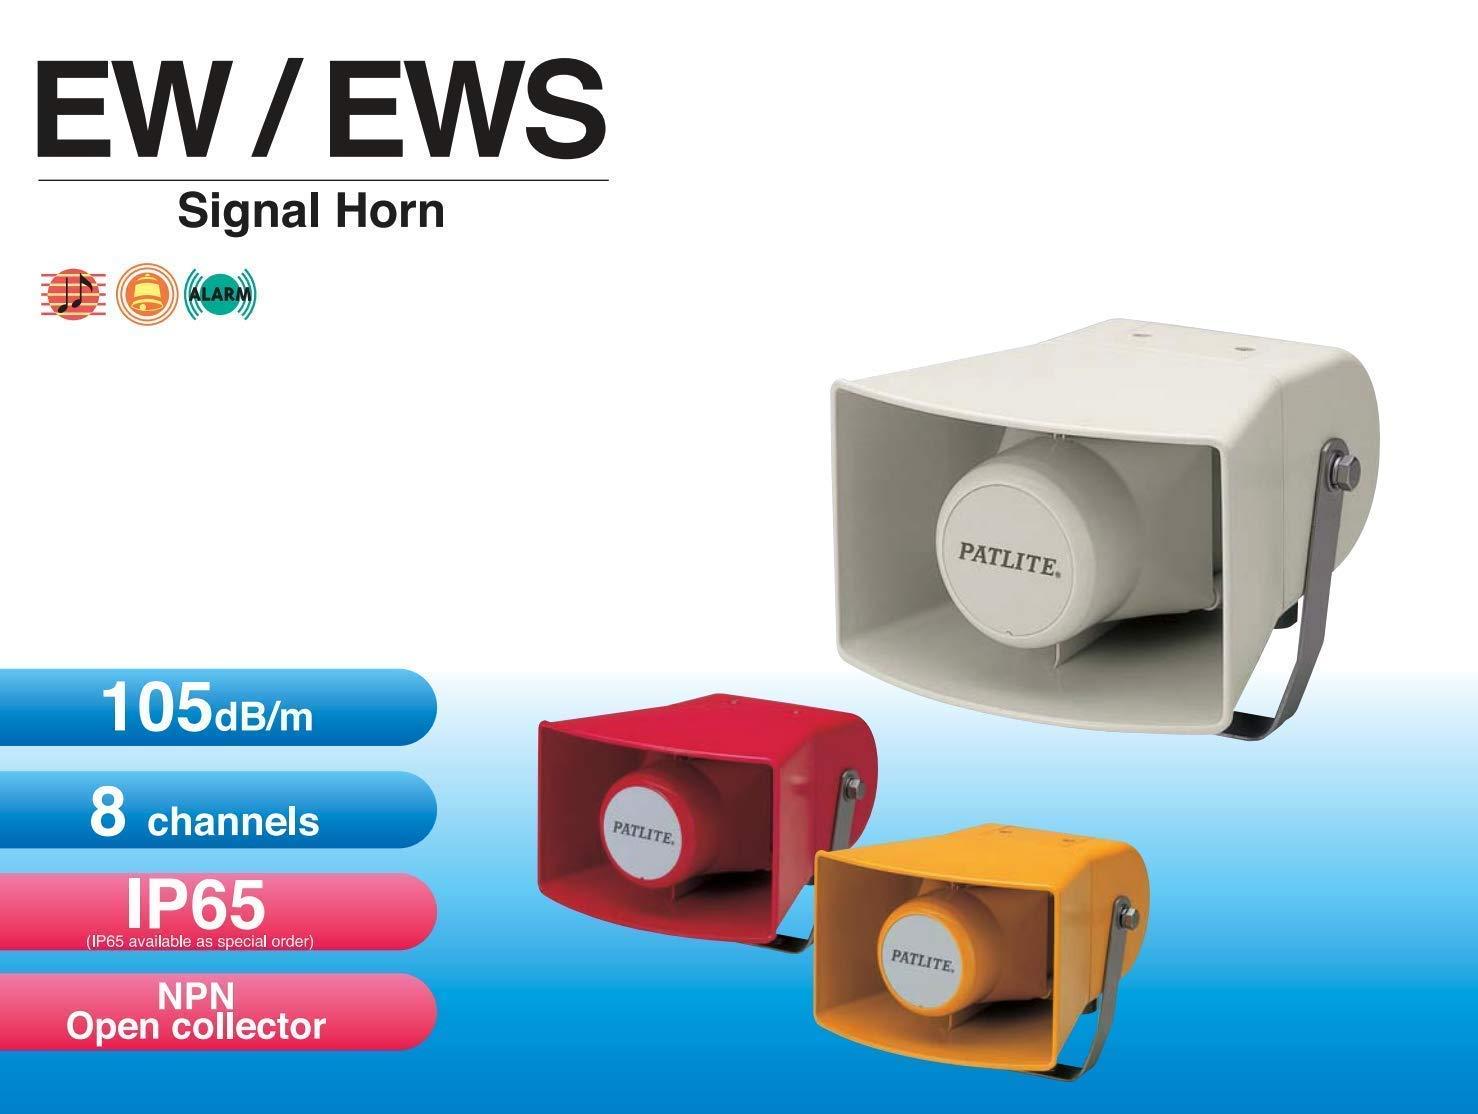 PATLITE EWS EWS-100KA-Y Horn Speaker Alarm Sounder Hooter Siren 8 x Built-in Alarm Tones by Patlite (Image #2)